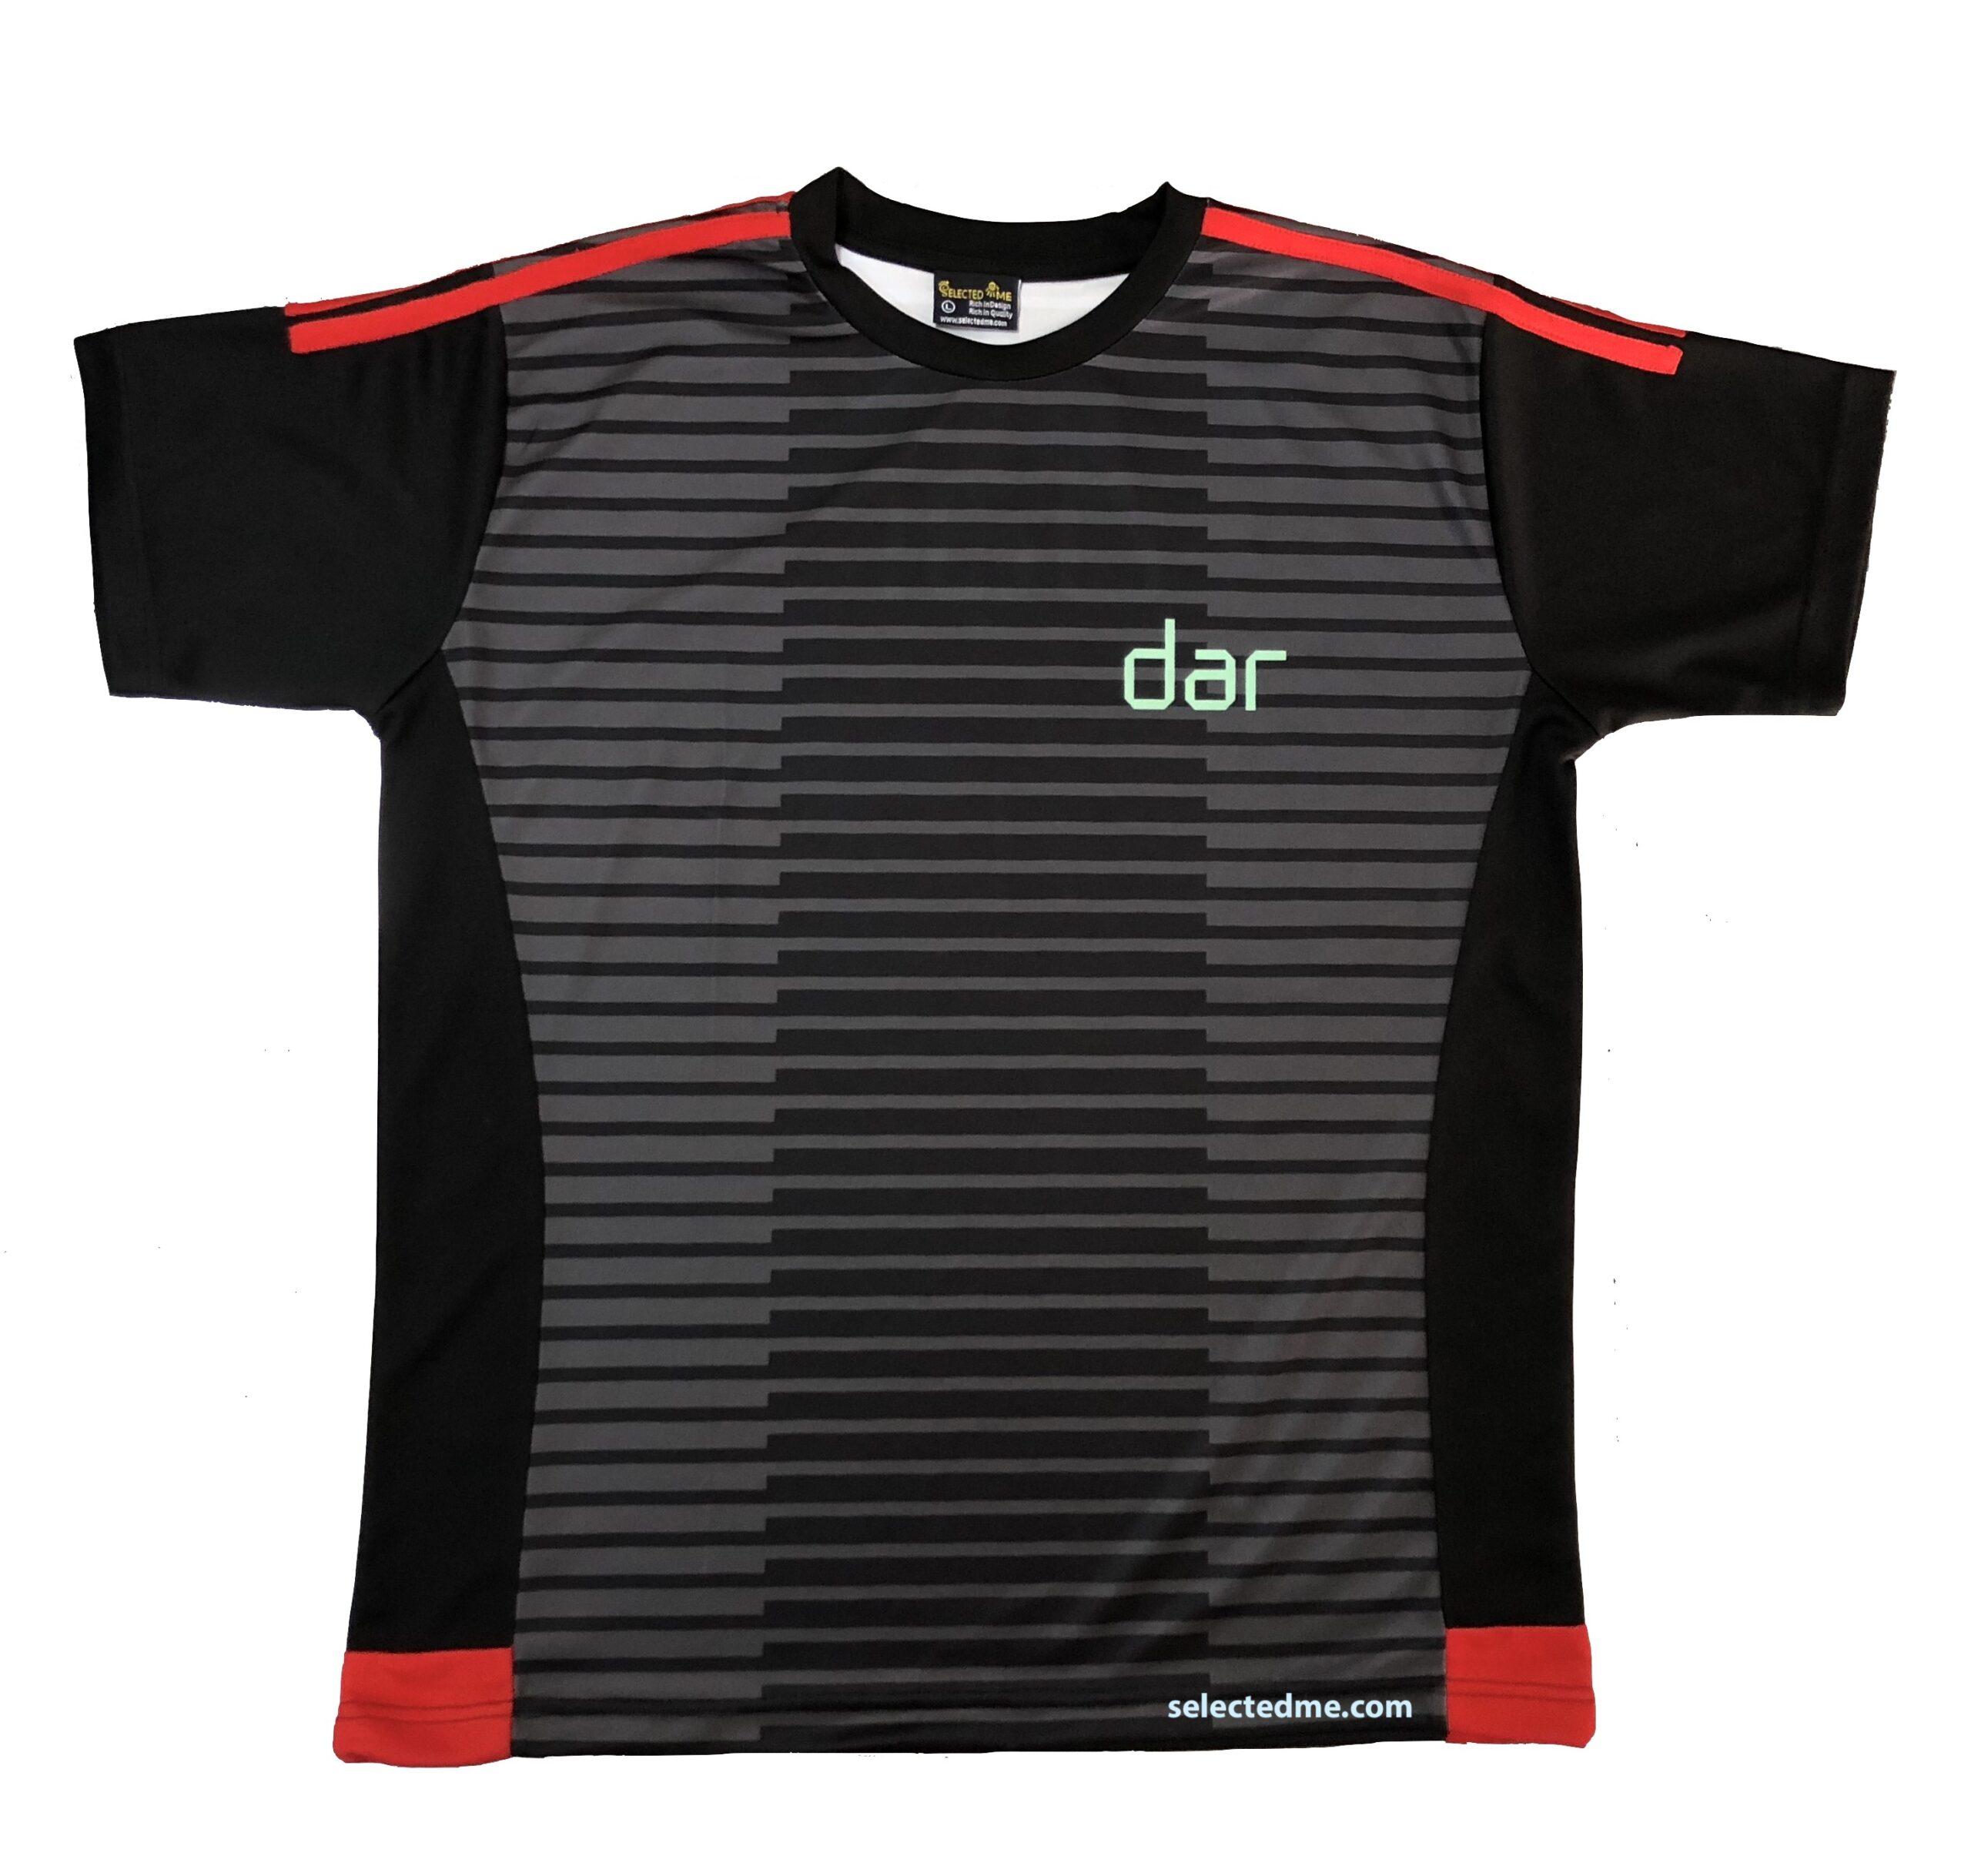 Sports Uniforms - Printed Custom Team Uniforms Wholesale